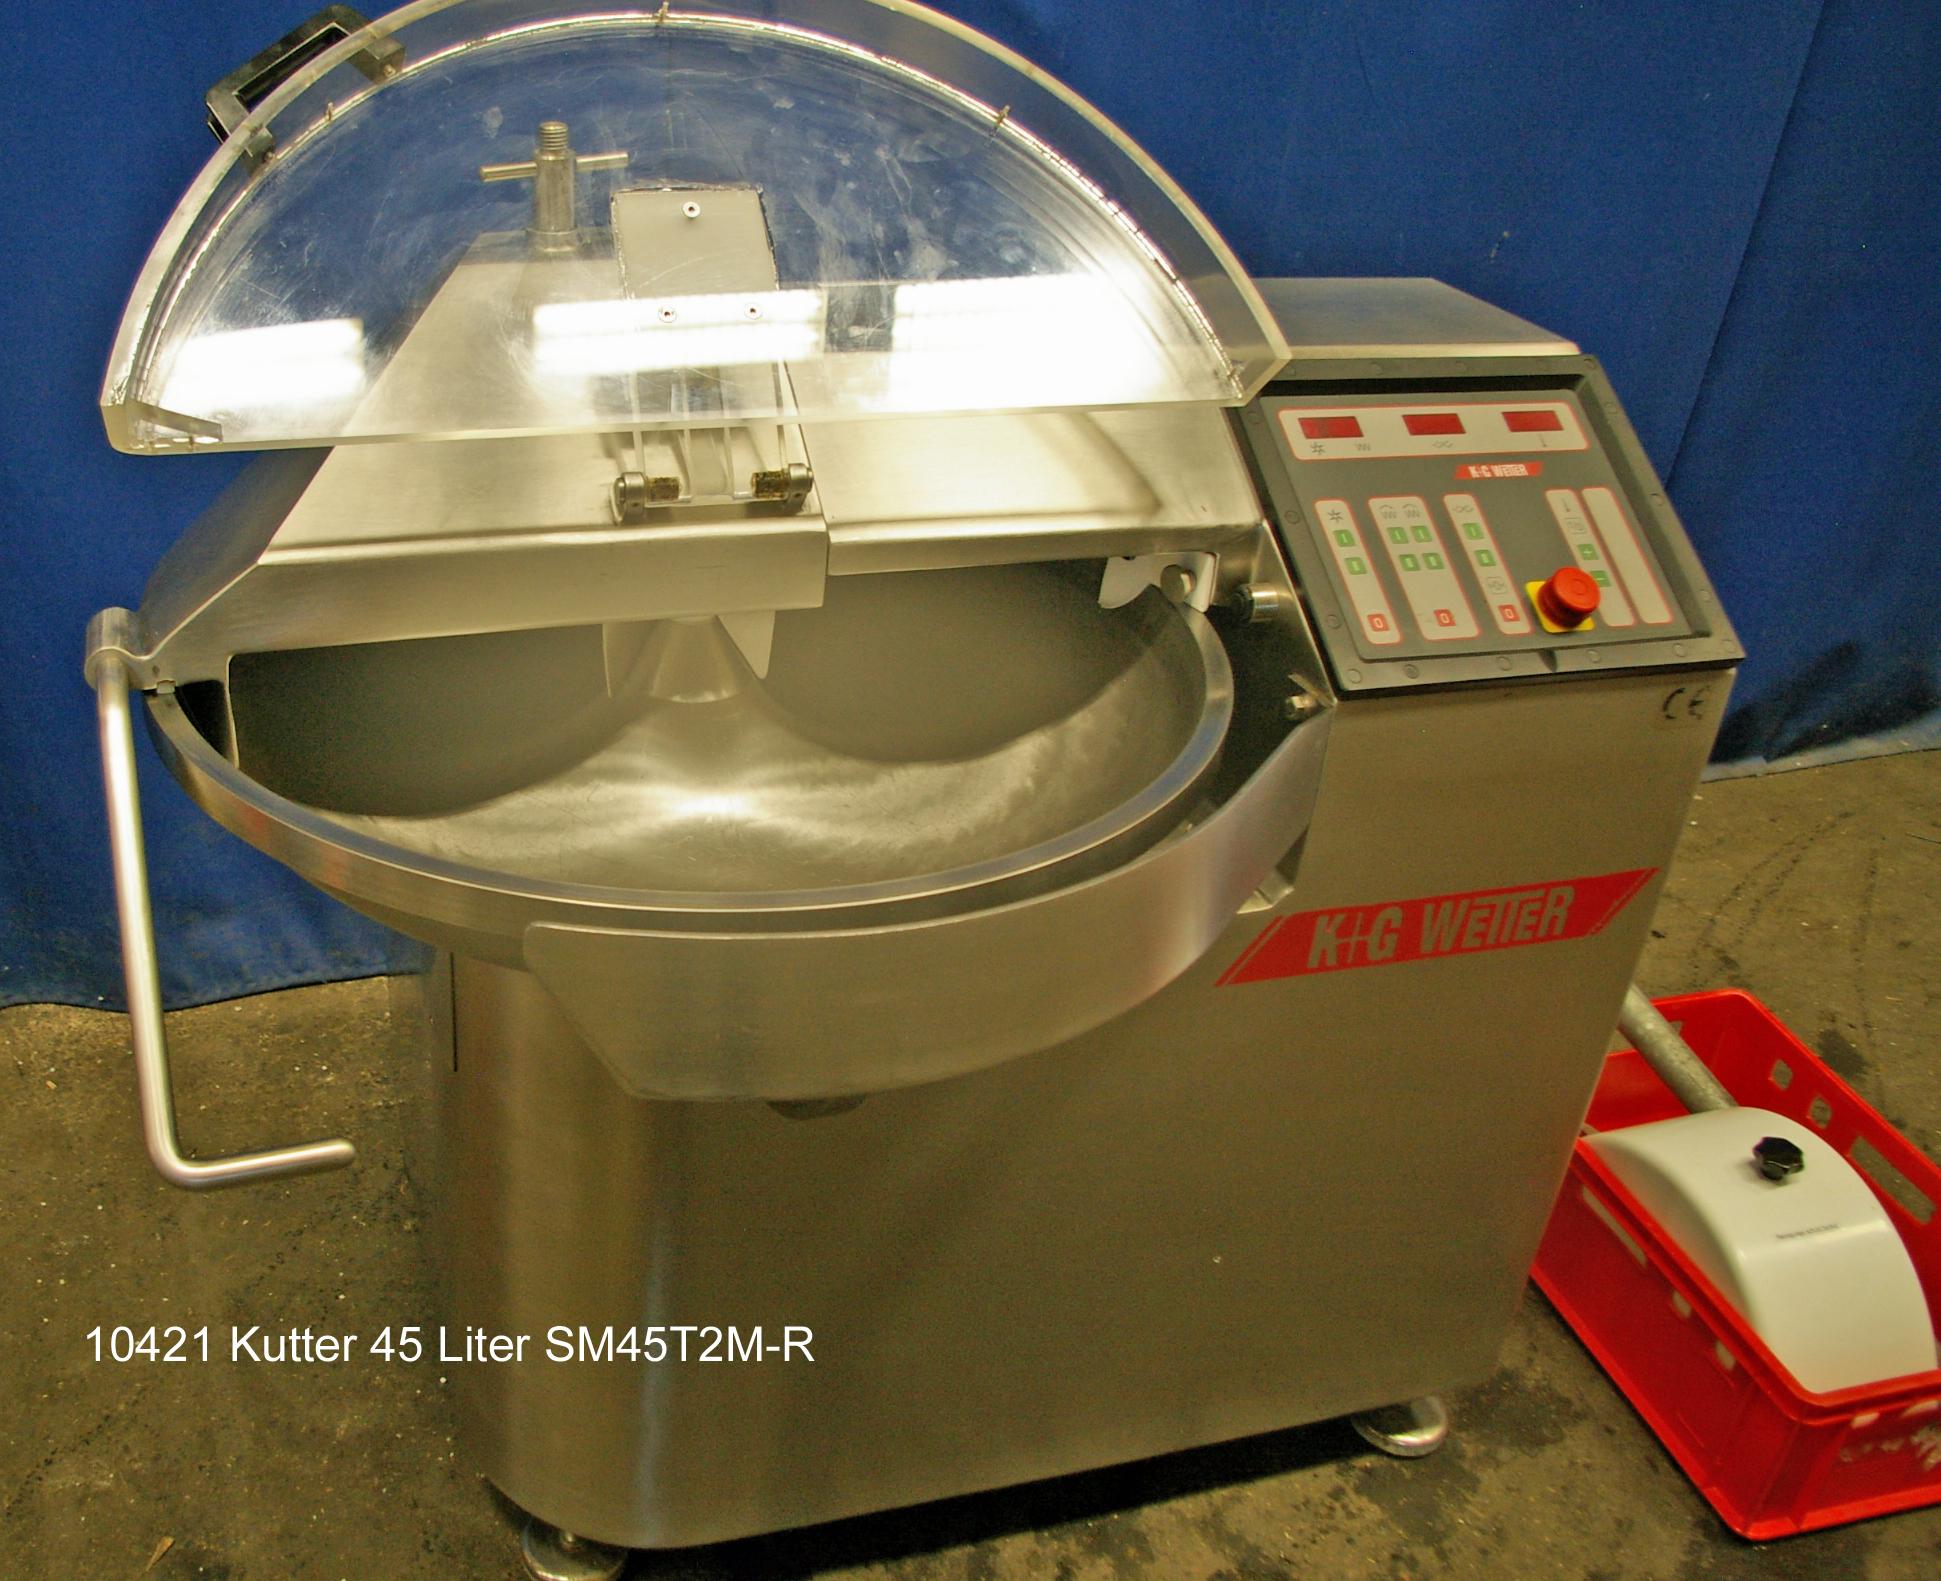 10421-b-Kutter-45-Liter-SM4